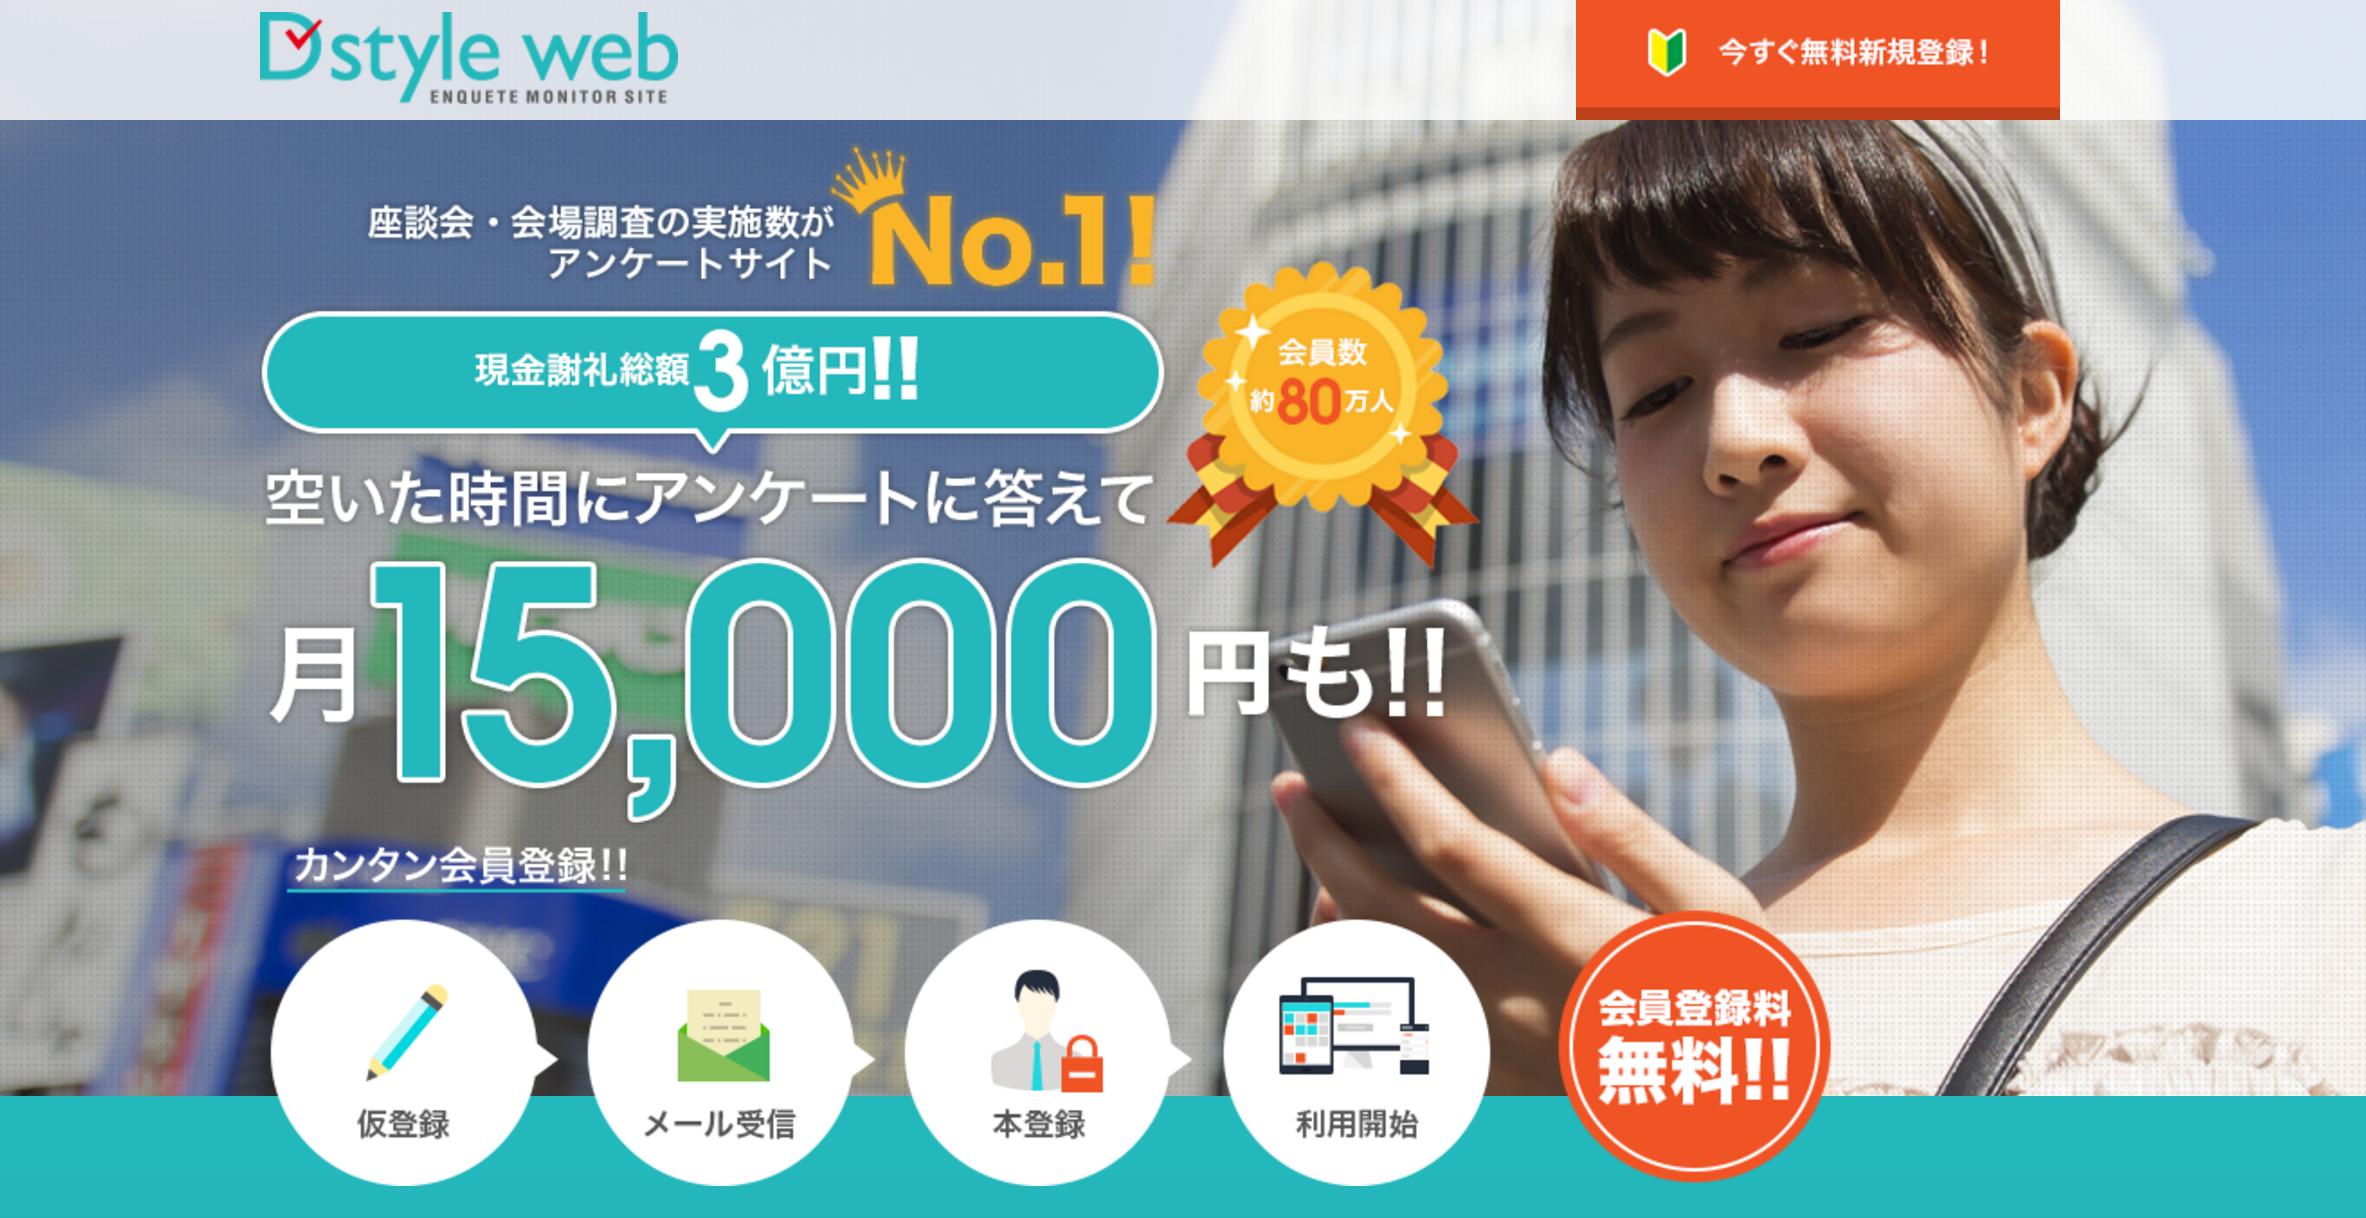 D Style Webのホームページ